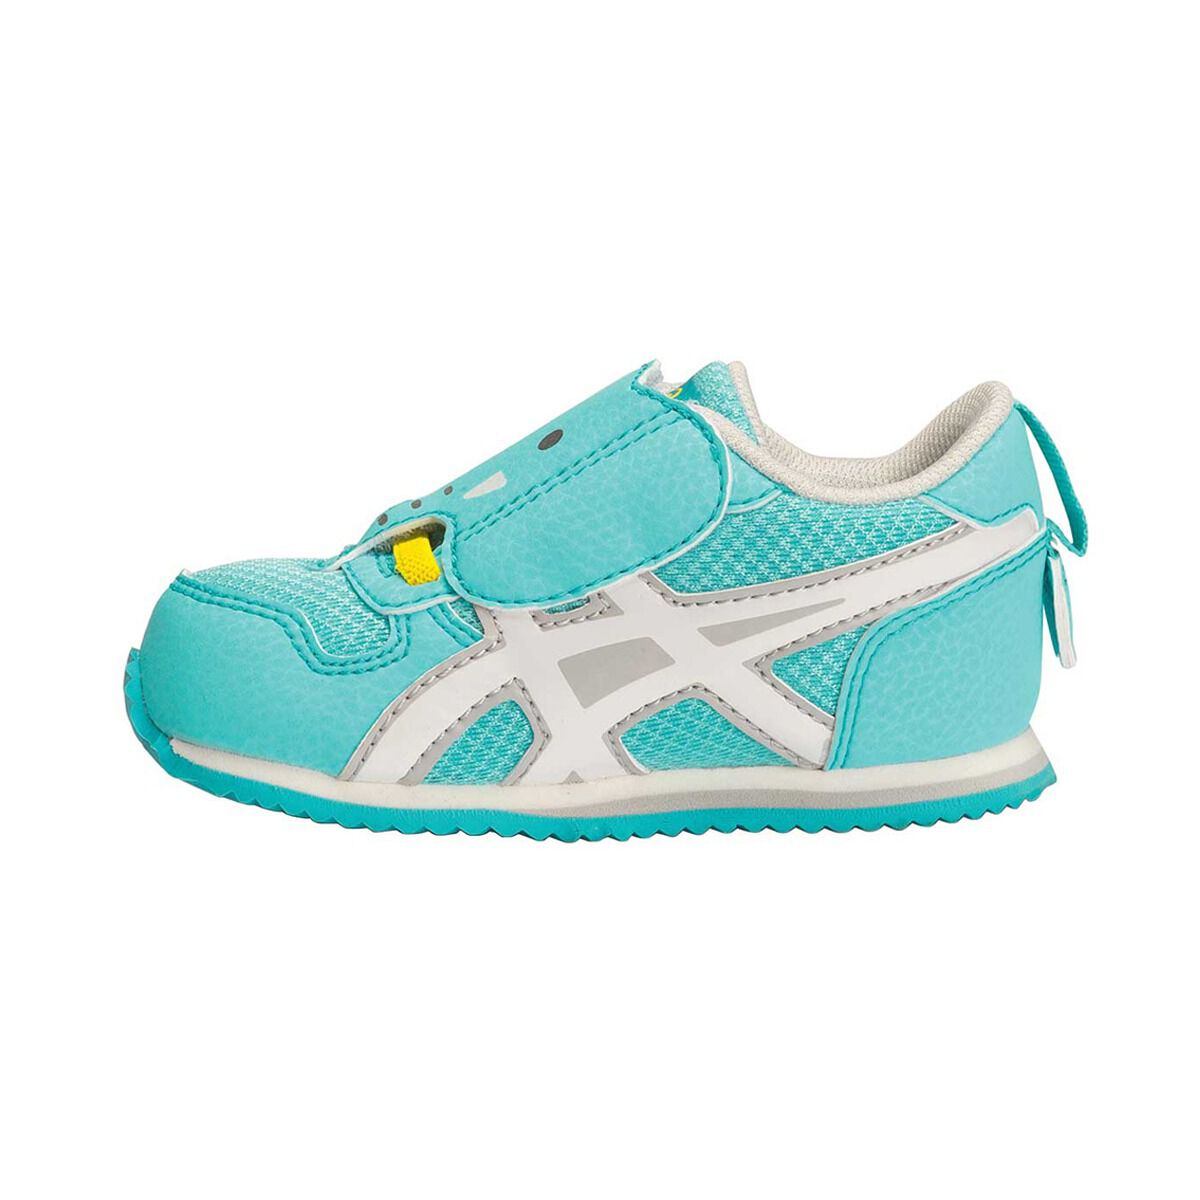 asics toddler shoes